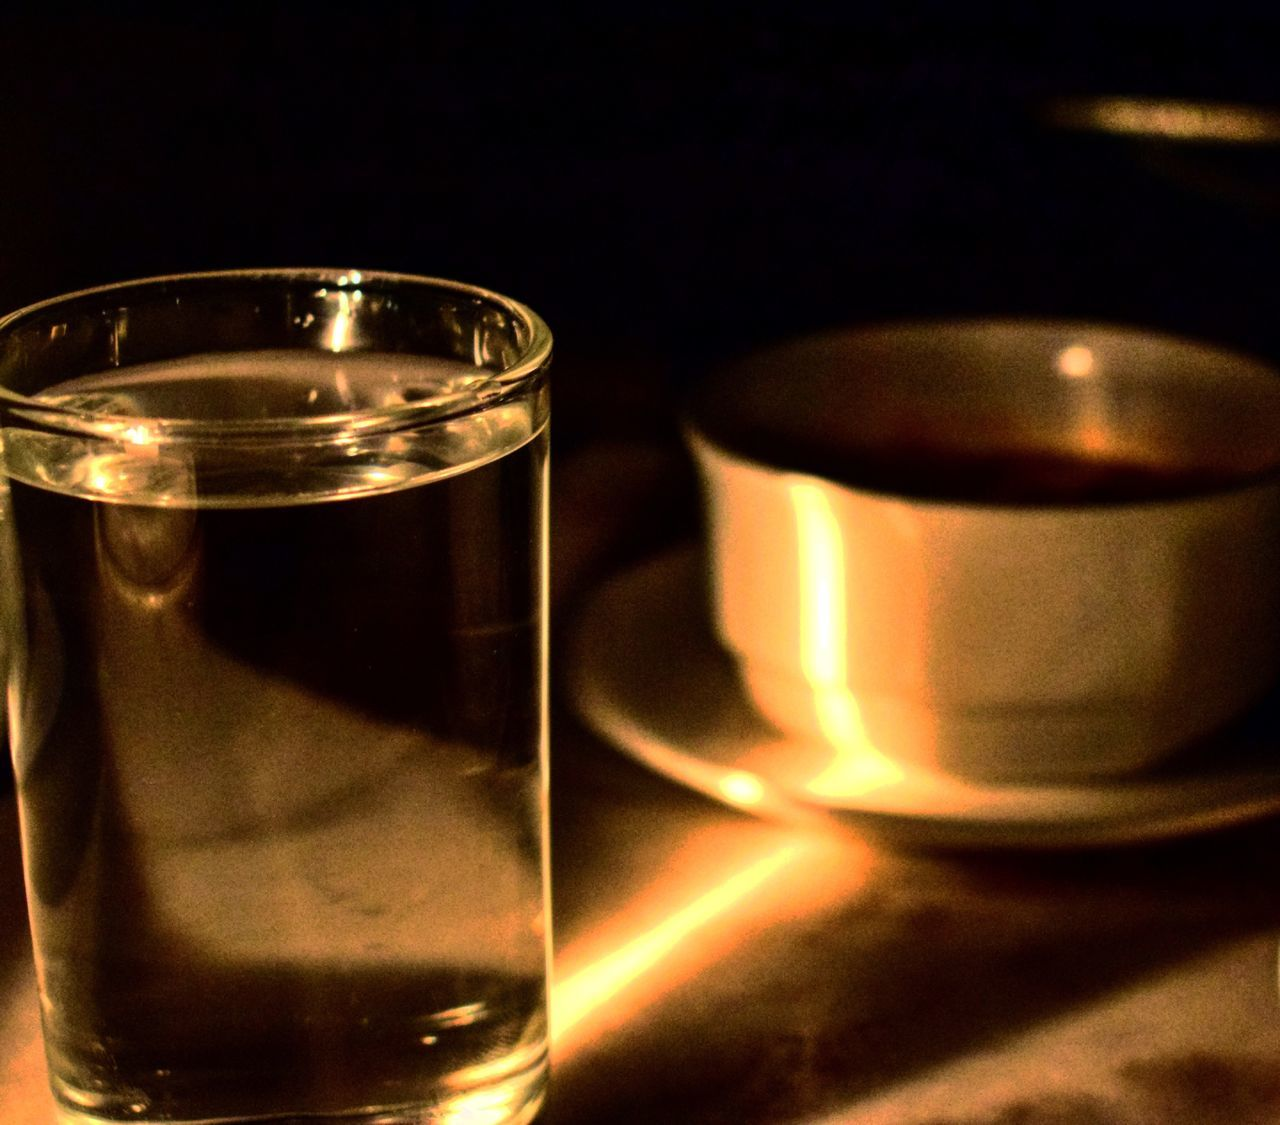 Reflections.. EyeEmNewHere Lightporn Light And Shadow light and reflection Closeup Food And Drink Indoors